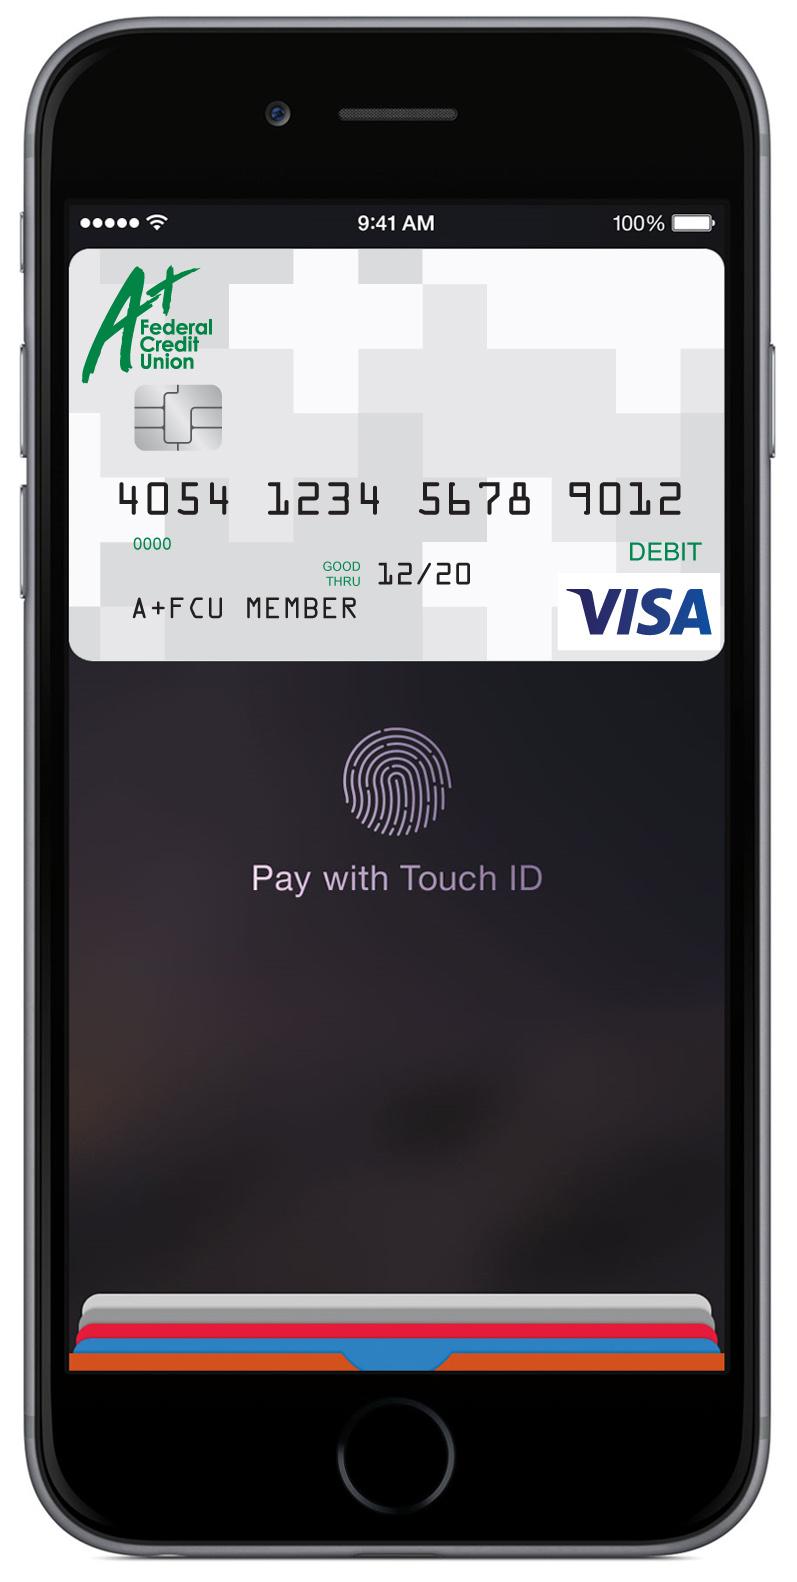 A+FCU with Apple Pay